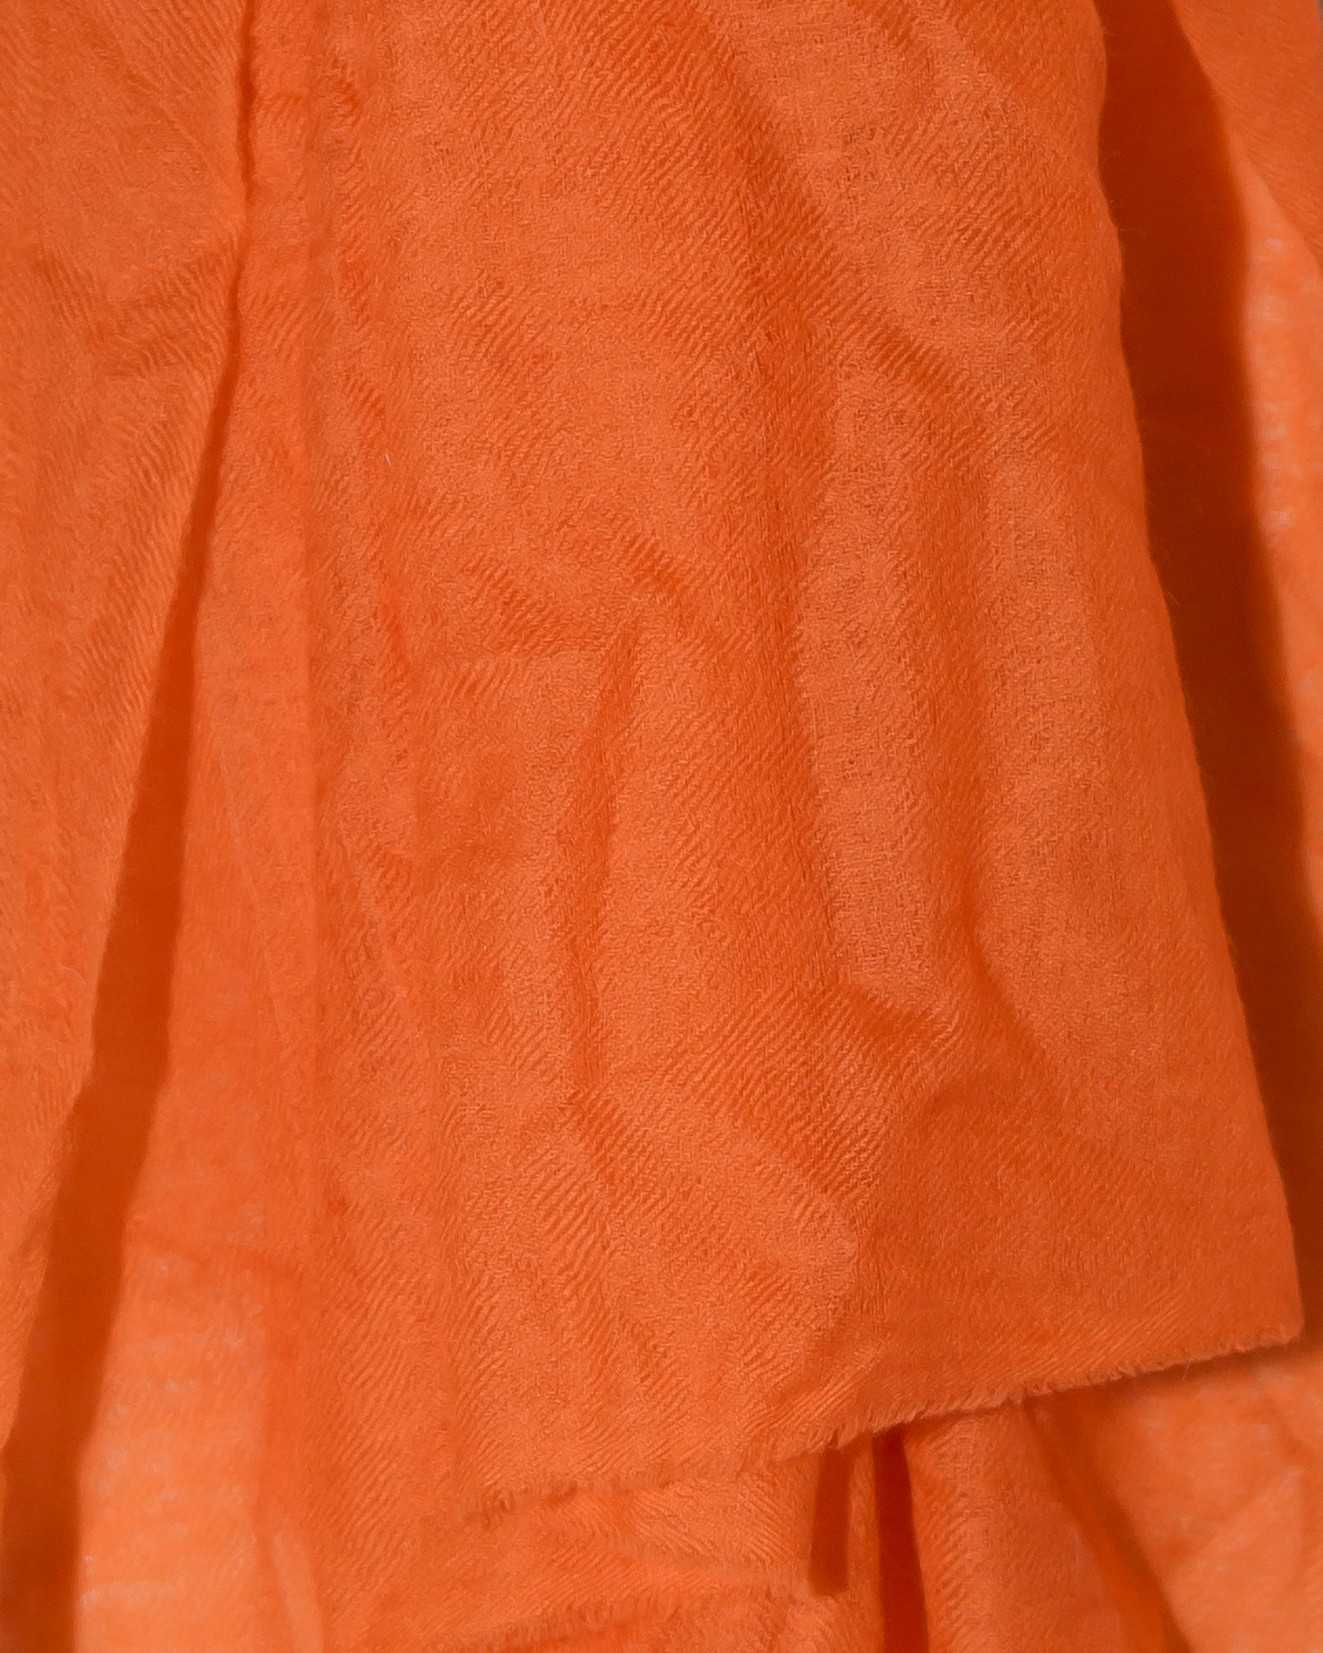 rivenditore all'ingrosso dc91a 3f0ab Kiru Orange